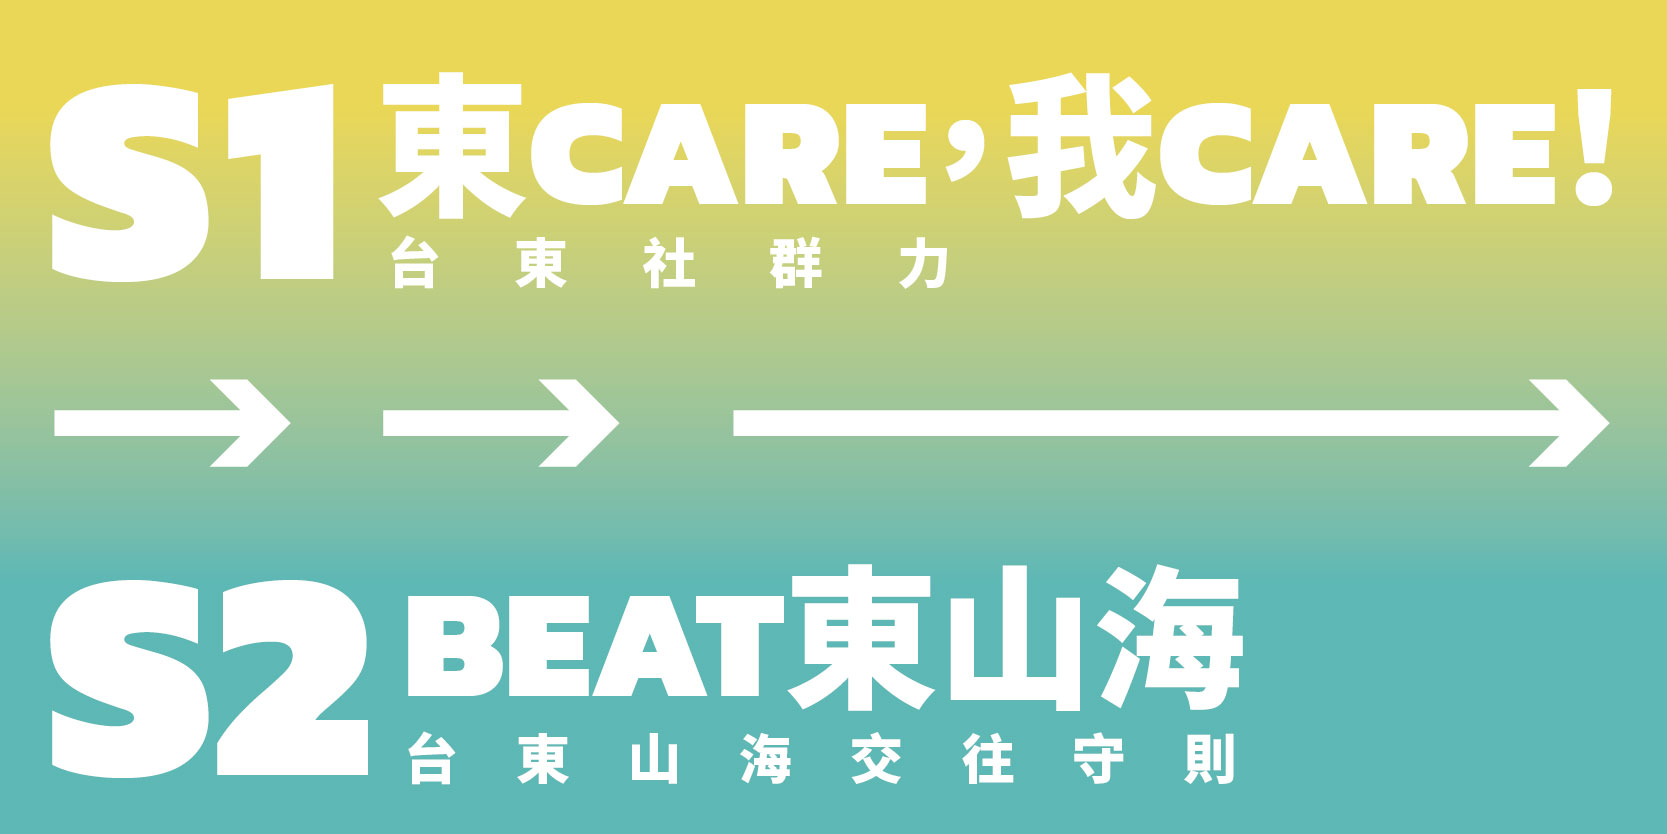 ▎S2 慢波電台 ⛰️ 準備好BEAT東山海了嗎? 